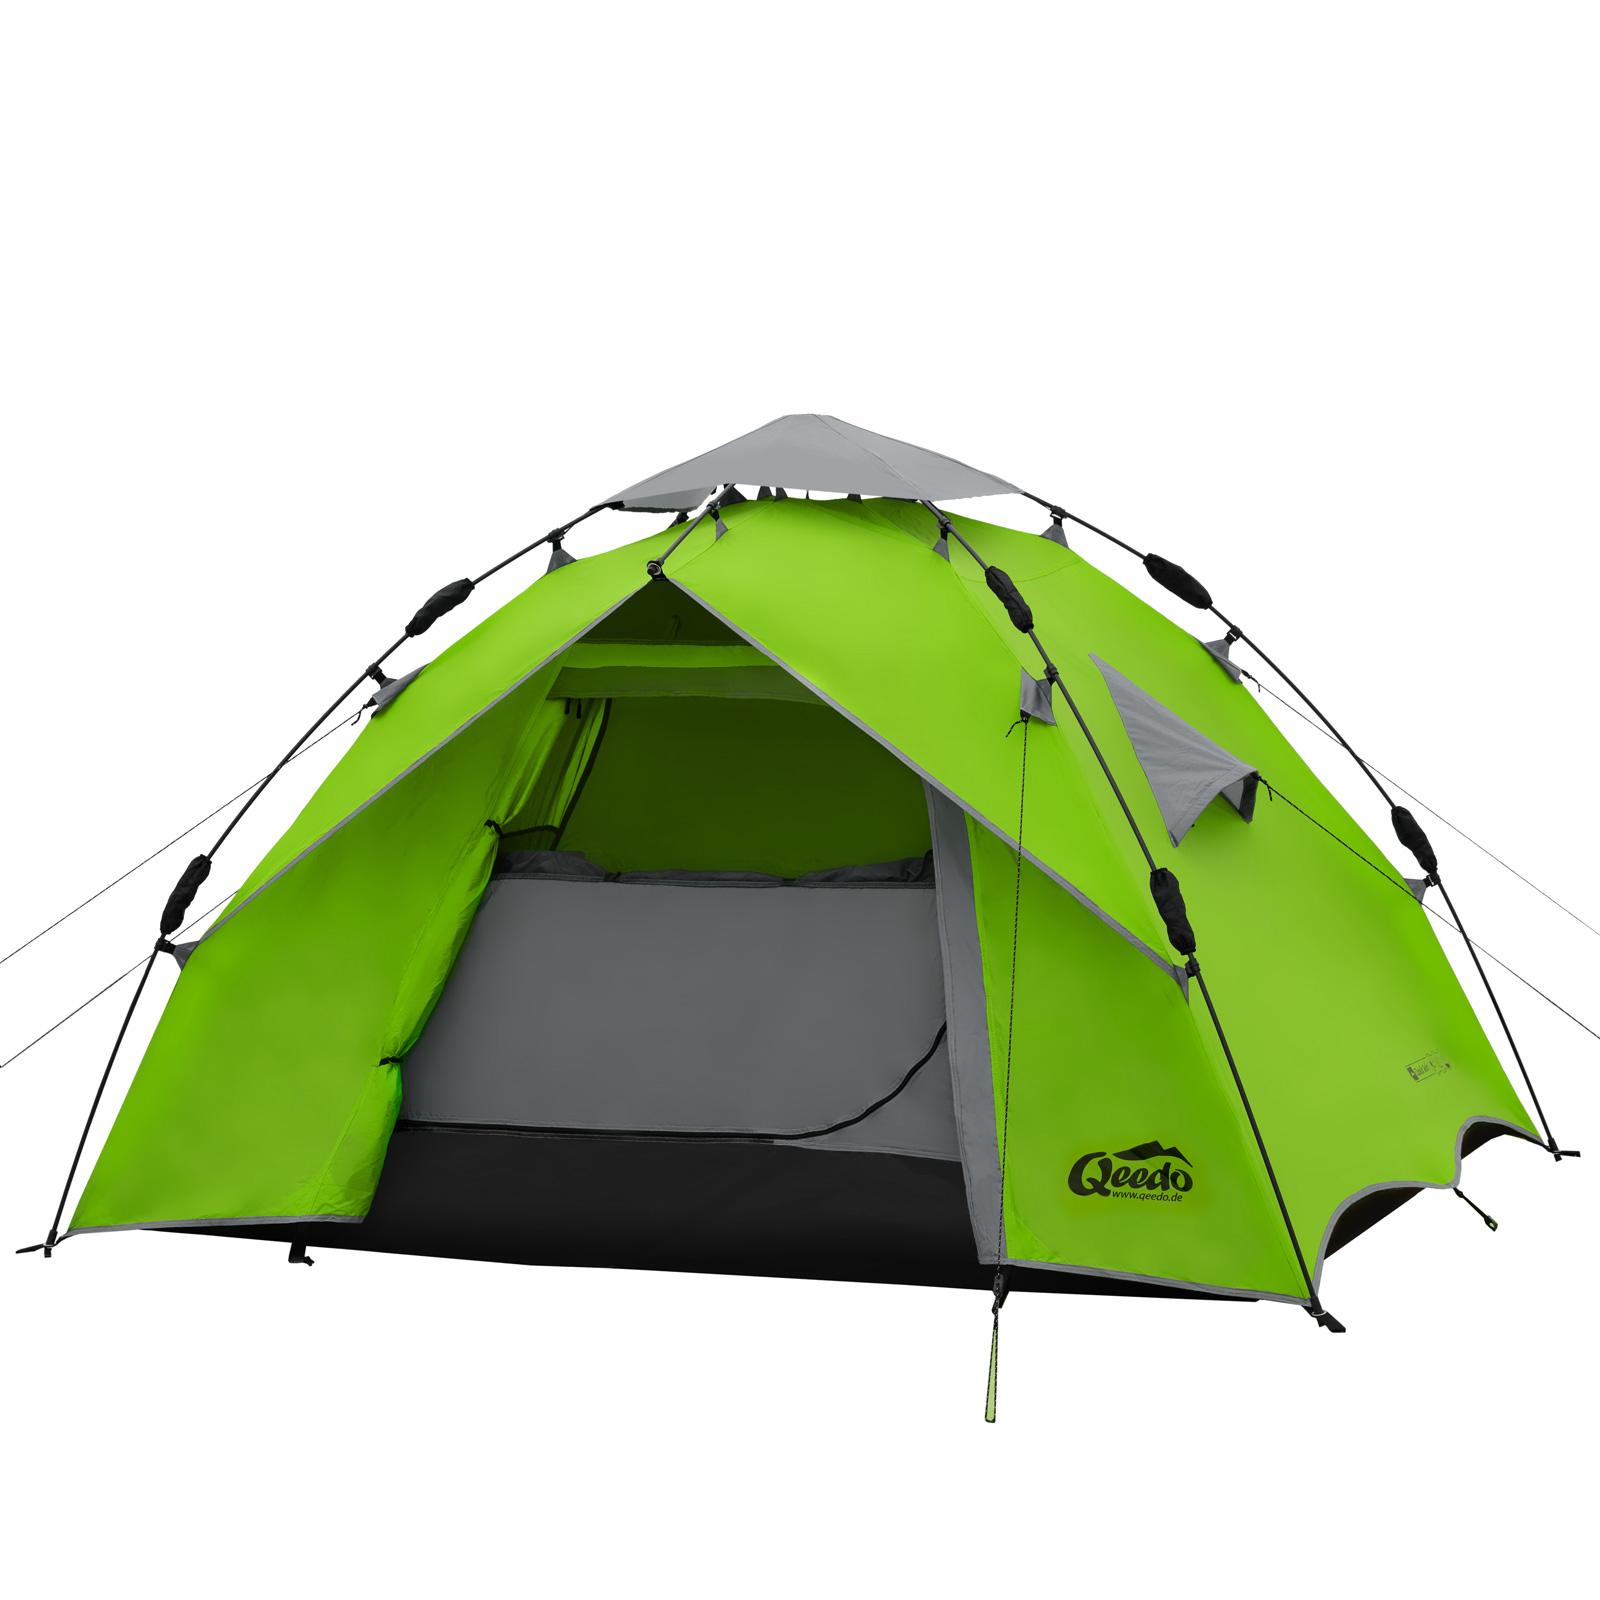 2 Mann Zelt Zum Wandern : Mann zelt qeedo quick ash sekundenzelt campingzelt